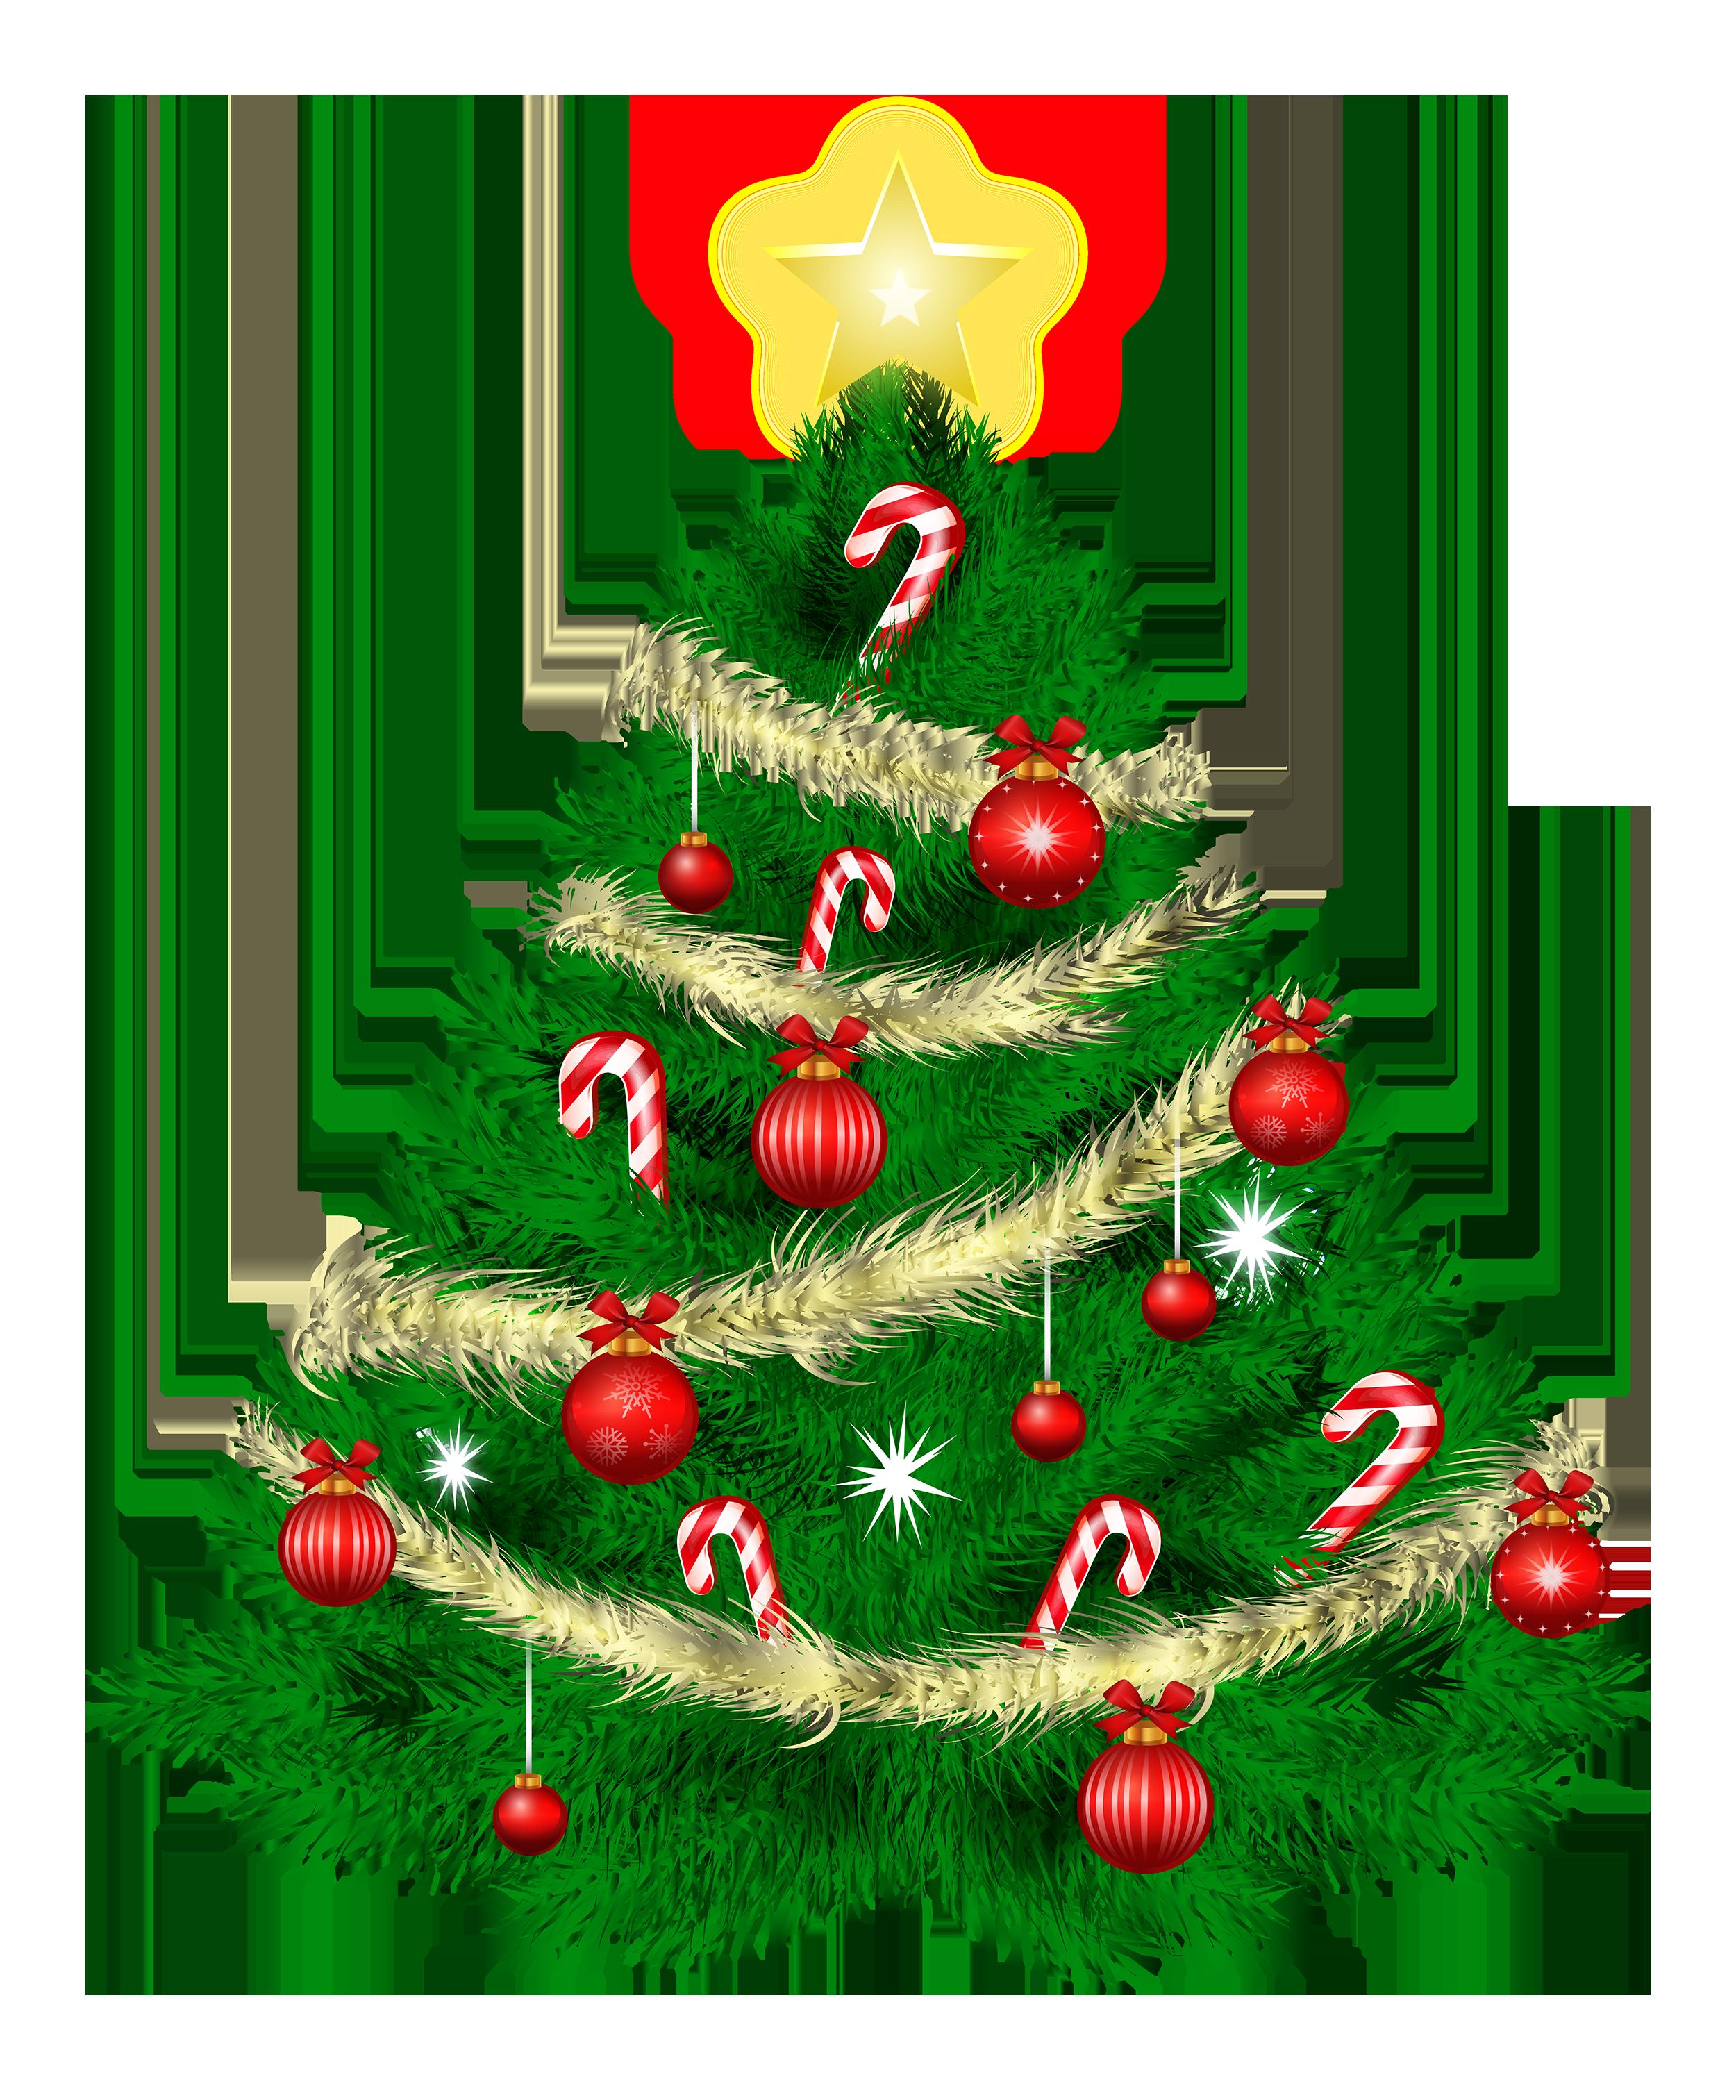 Free Christmas Tree Clipart Public Domai-Free christmas tree clipart public domain clip art 3-18